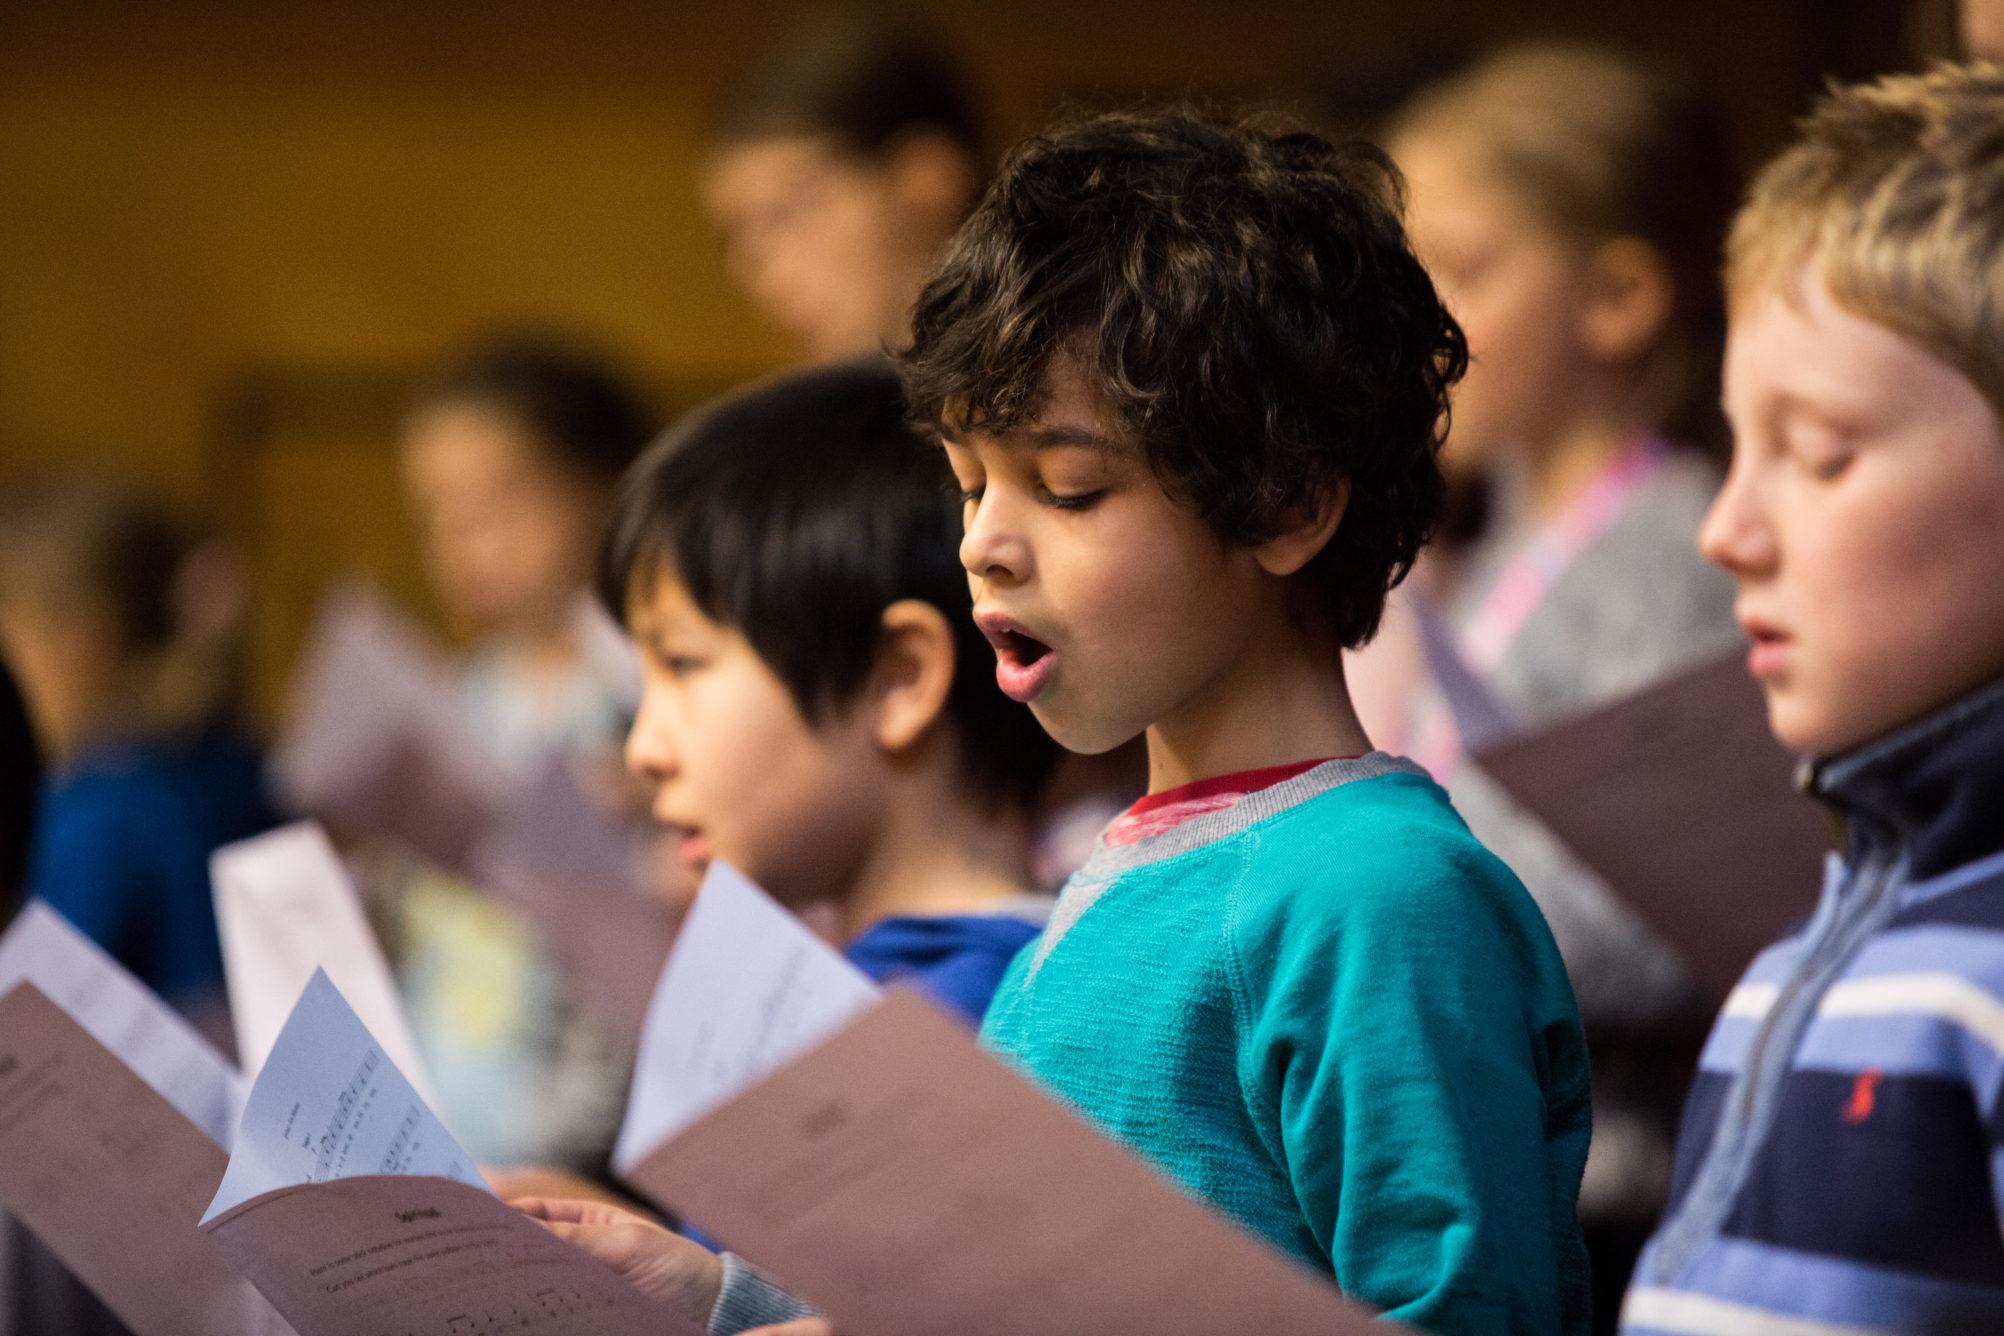 Children singing from song sheets; image Royal Conservatoire of Scotland, photographer Robert McFadzean